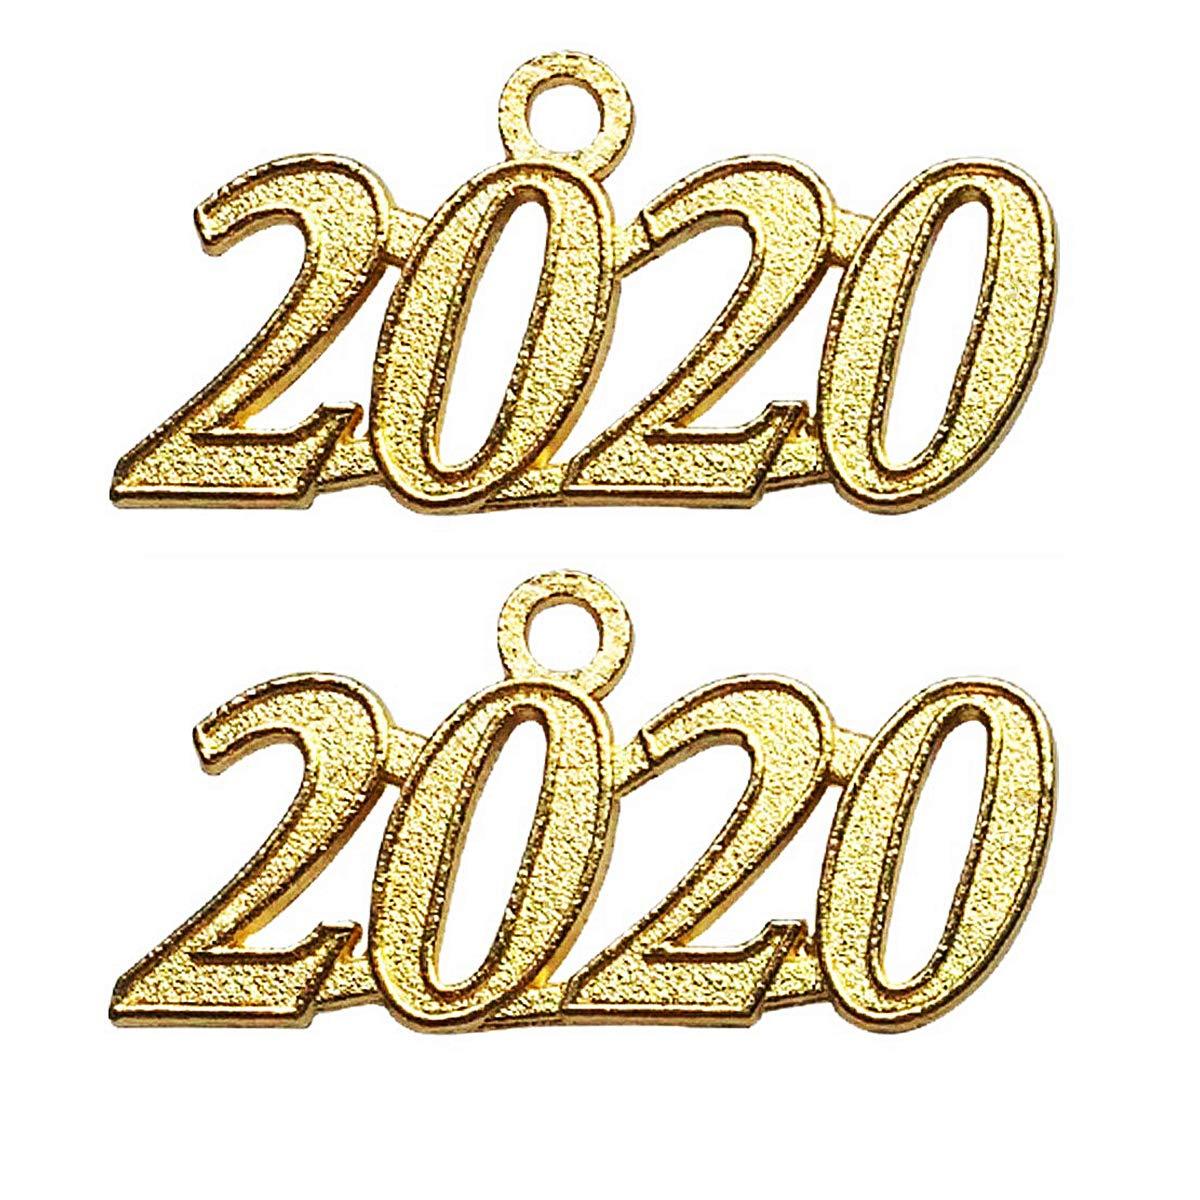 Graduation Tassels 2020.Czorange 2020 Year Signet Gold Color Charm For Graduation Tassel Grad Days 2 Pack